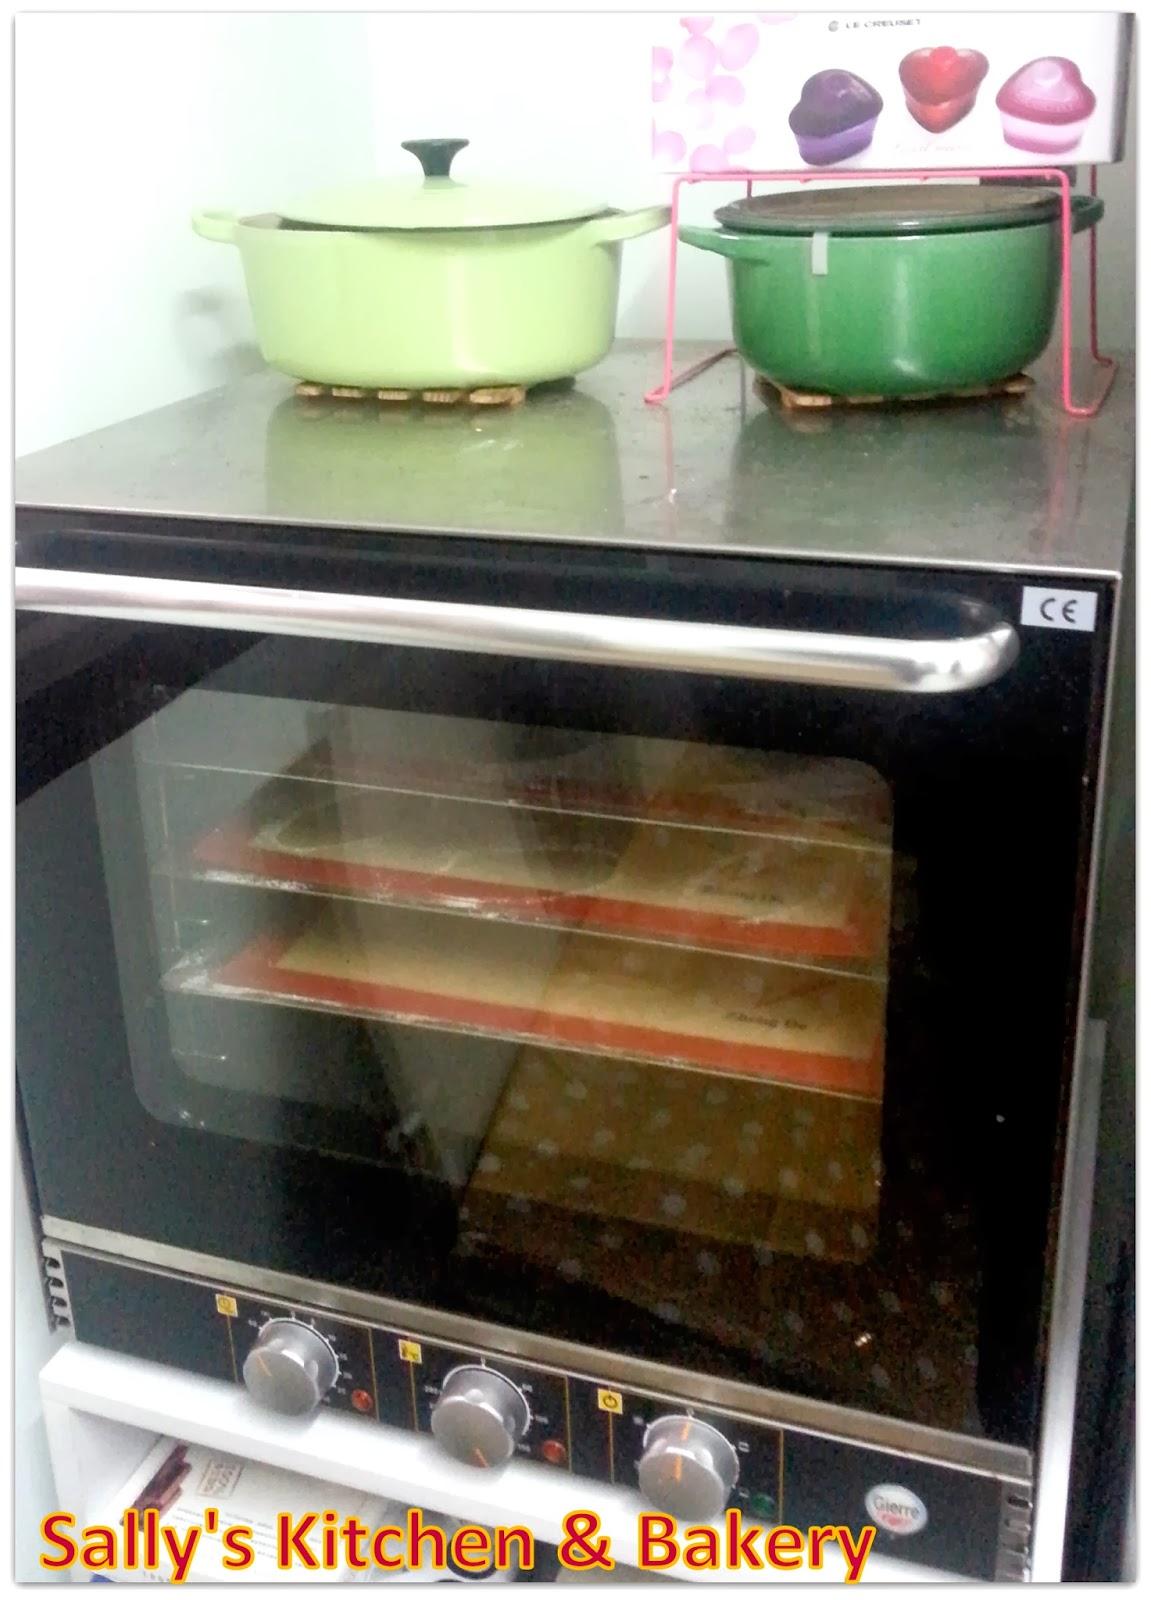 Sally's Kitchen & Bakery: 我的Gierre大焗爐